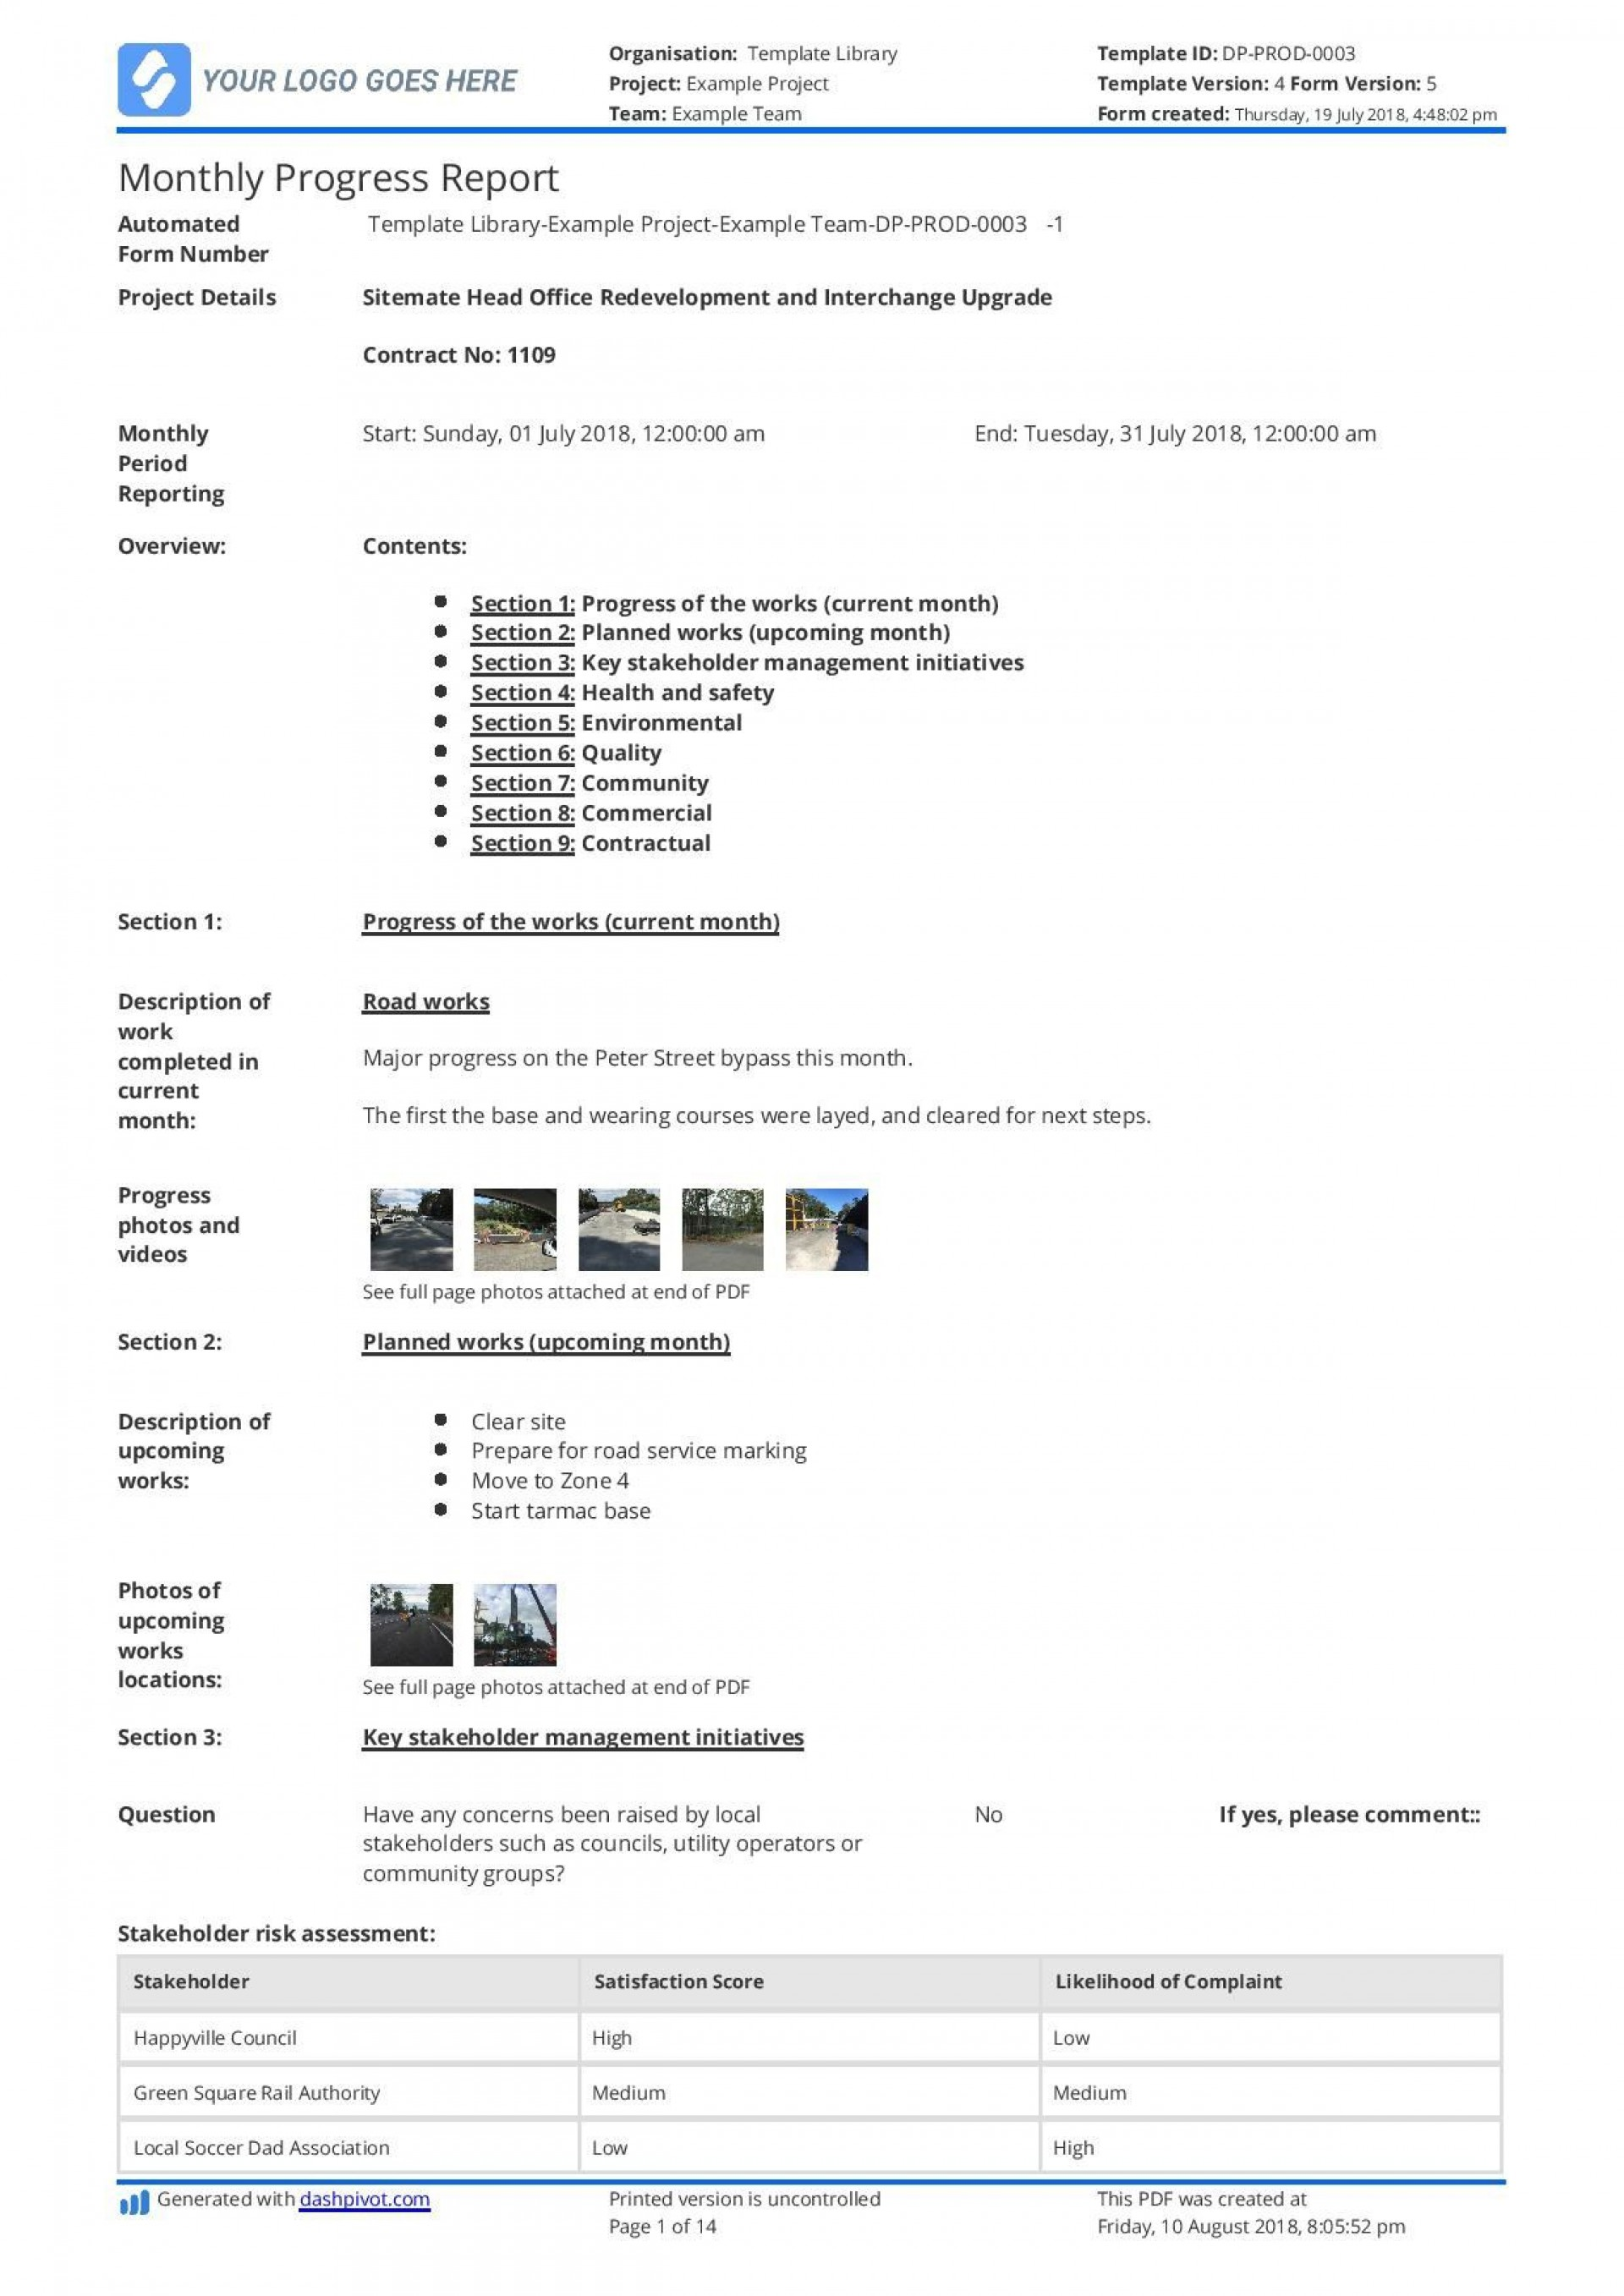 005 Wondrou Project Management Monthly Progres Report Template Photo 1920